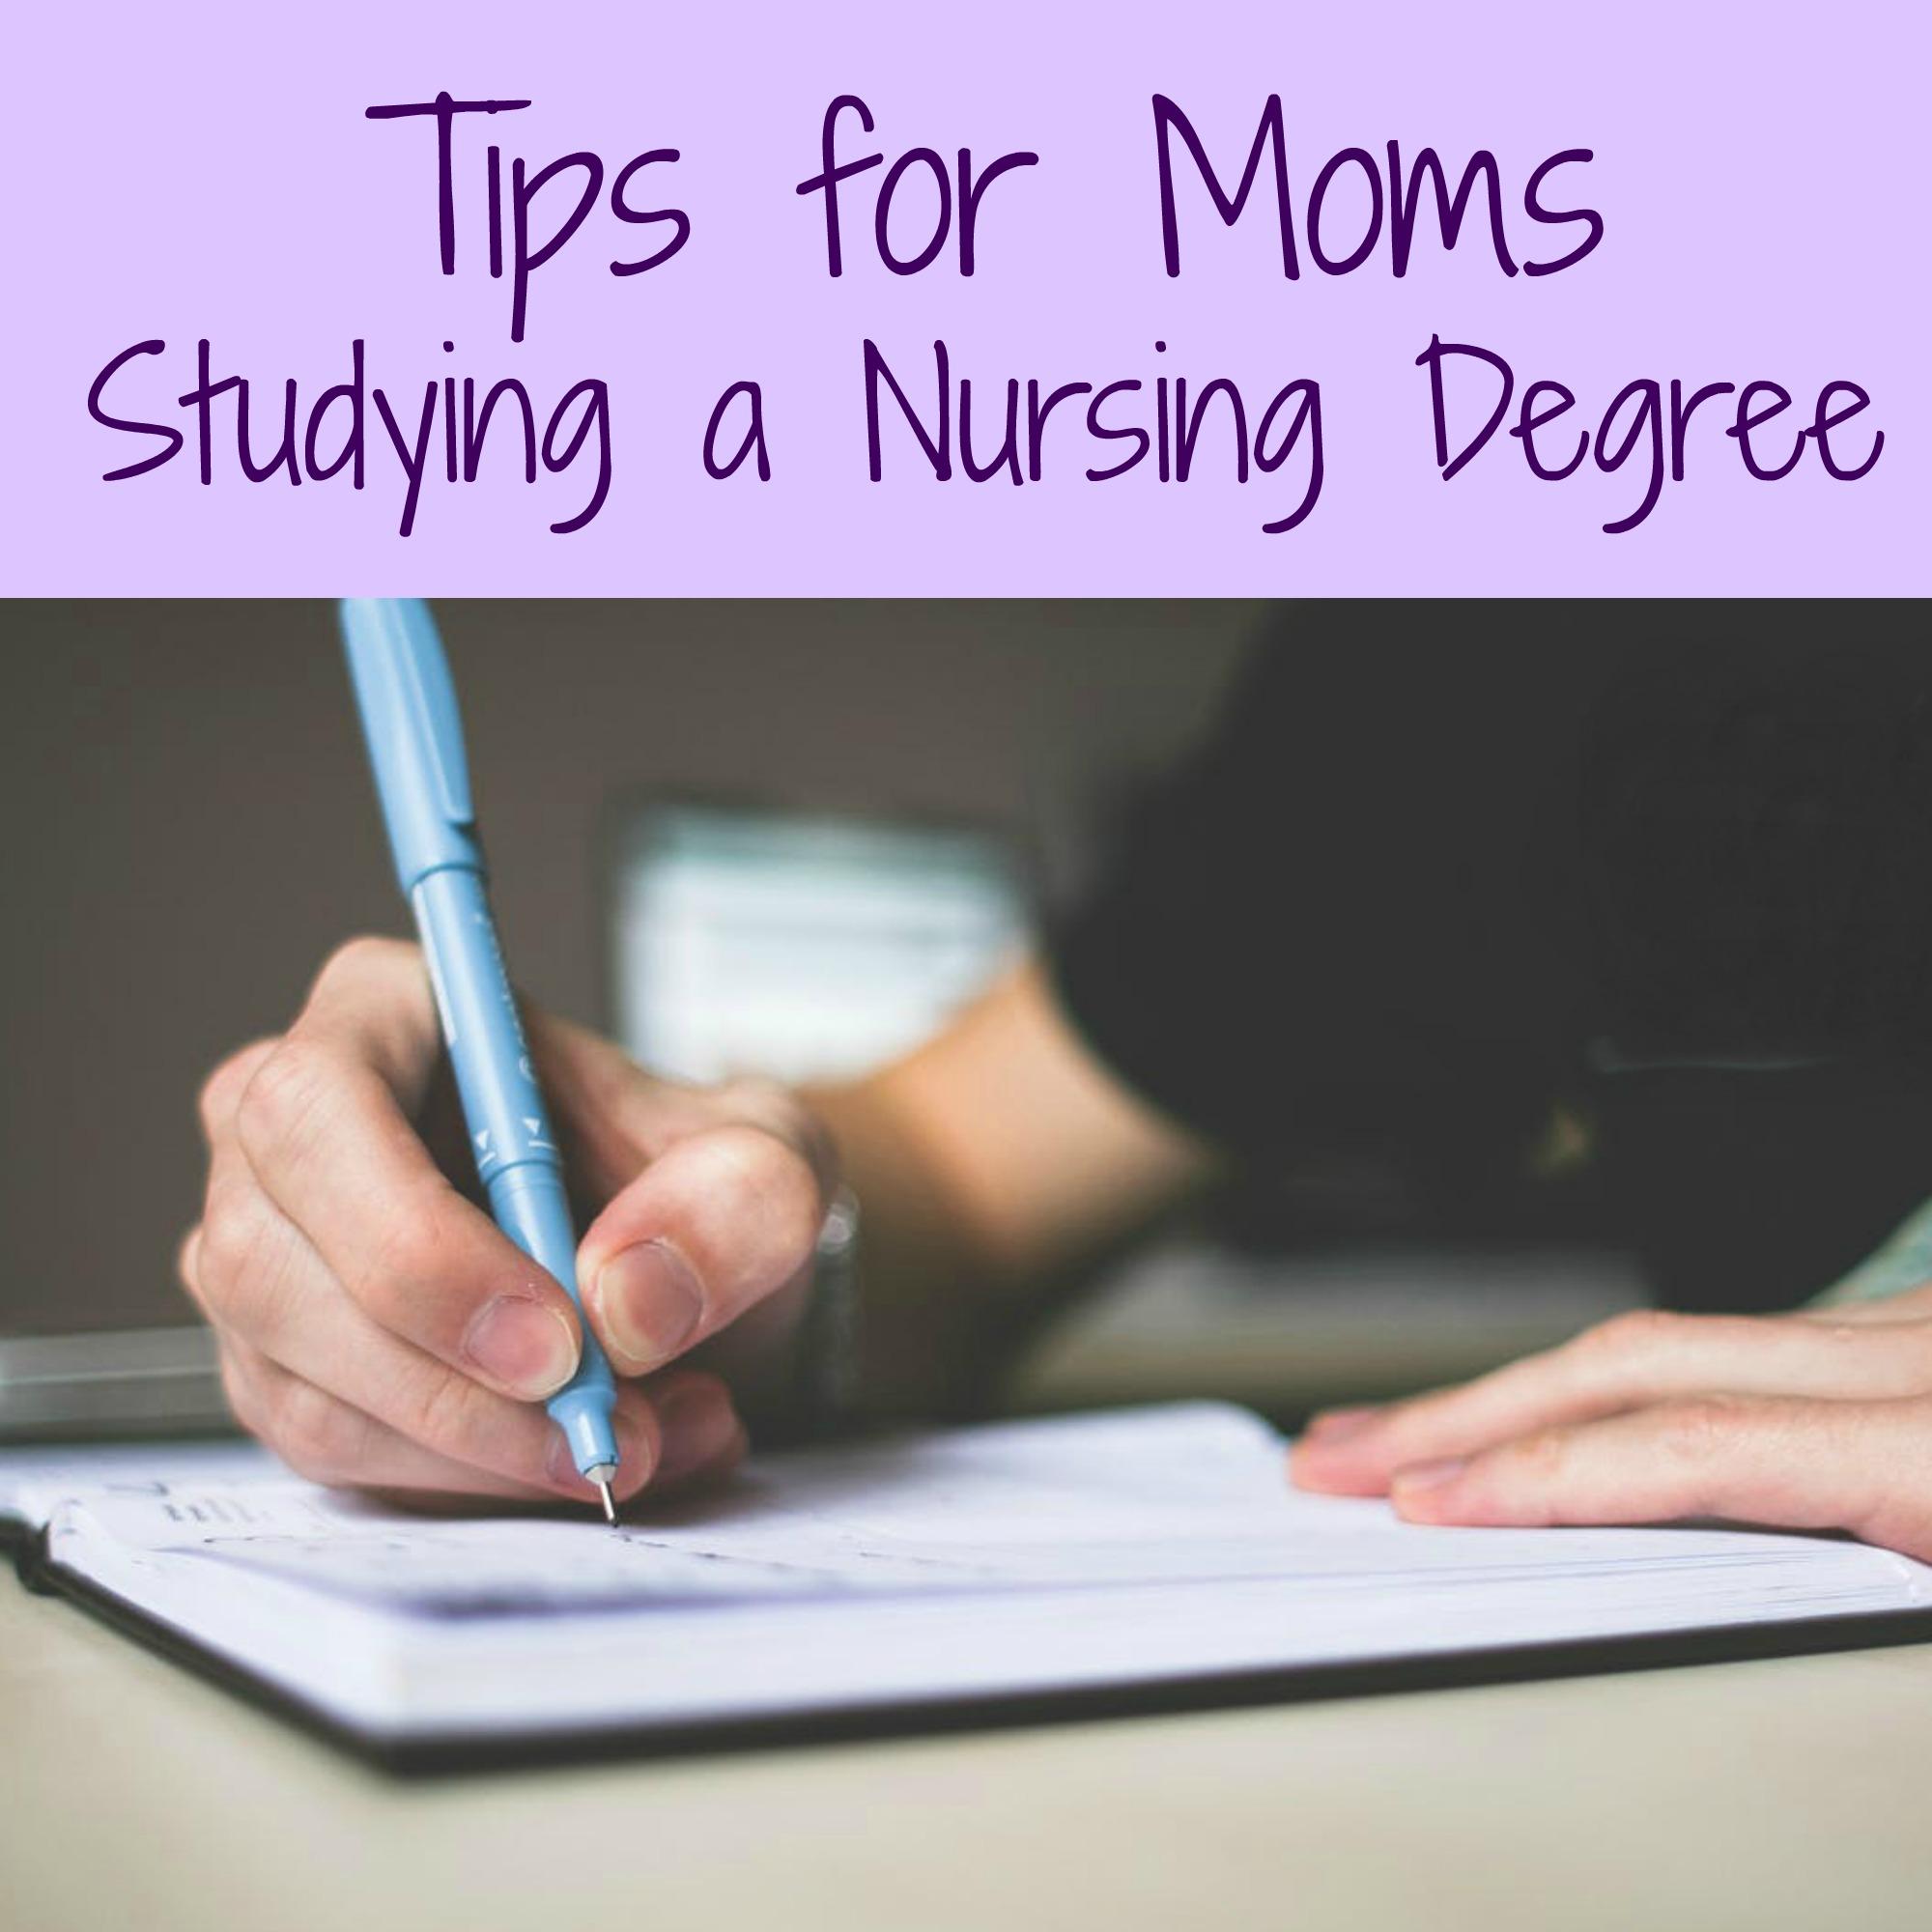 Tips for Moms Studying a Nursing Degree